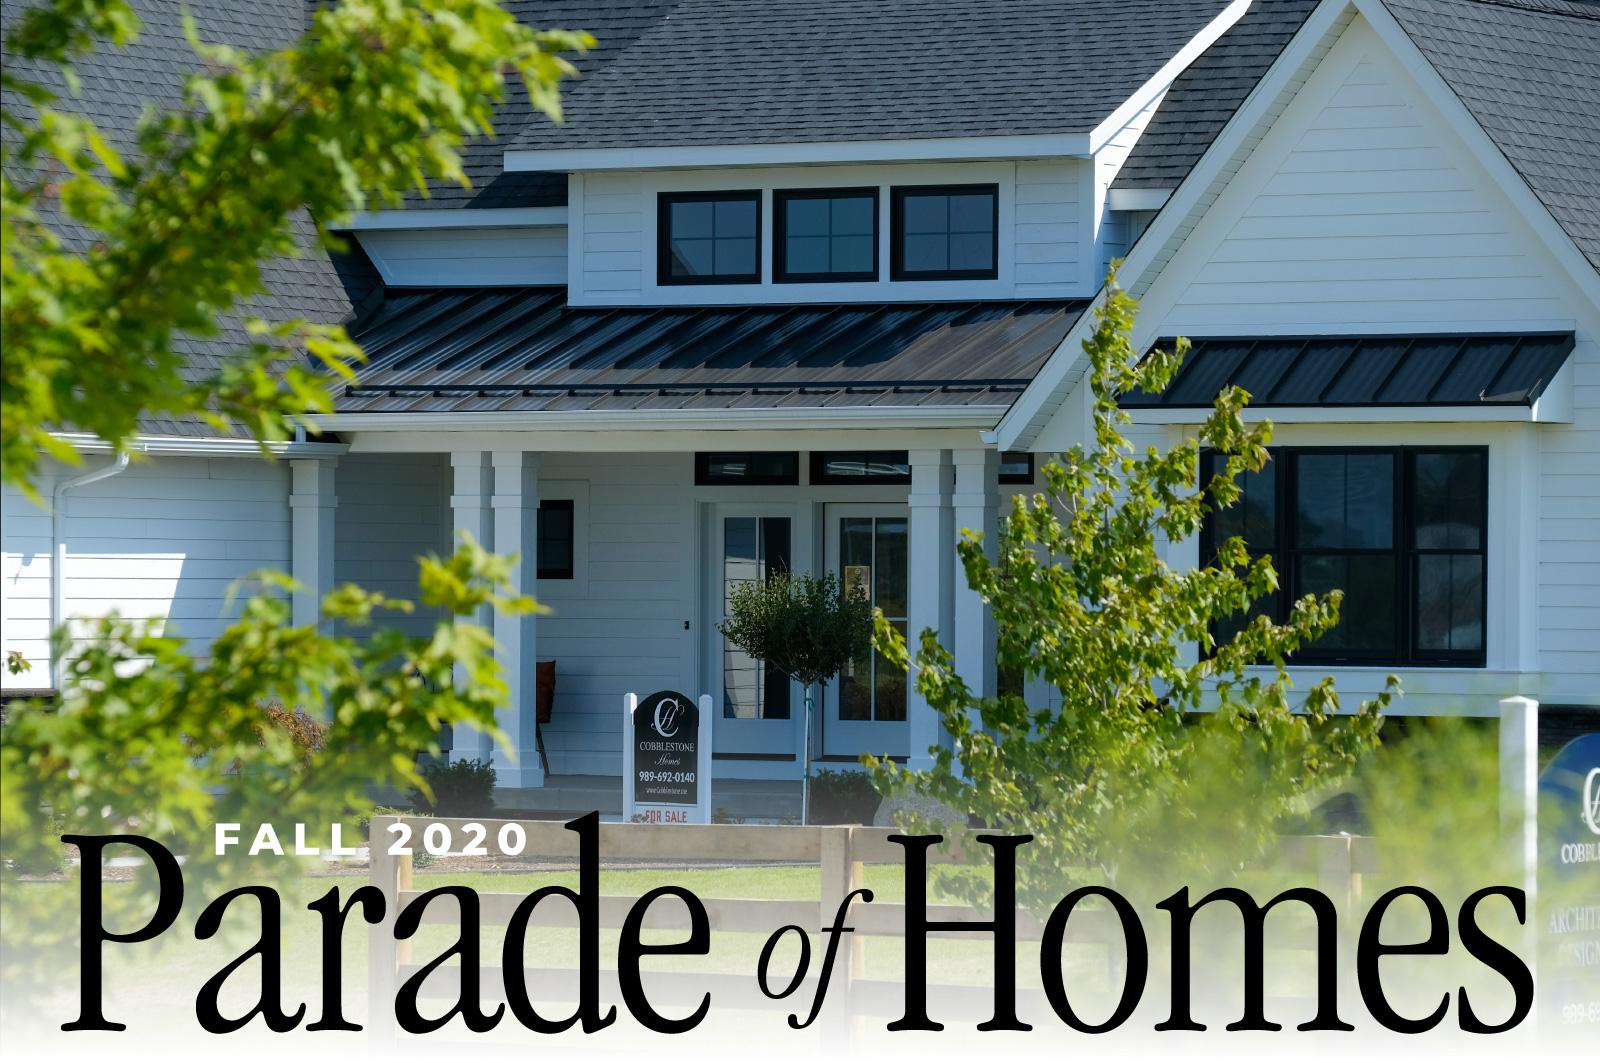 Midland and Saginaw Parade of Homes 2020